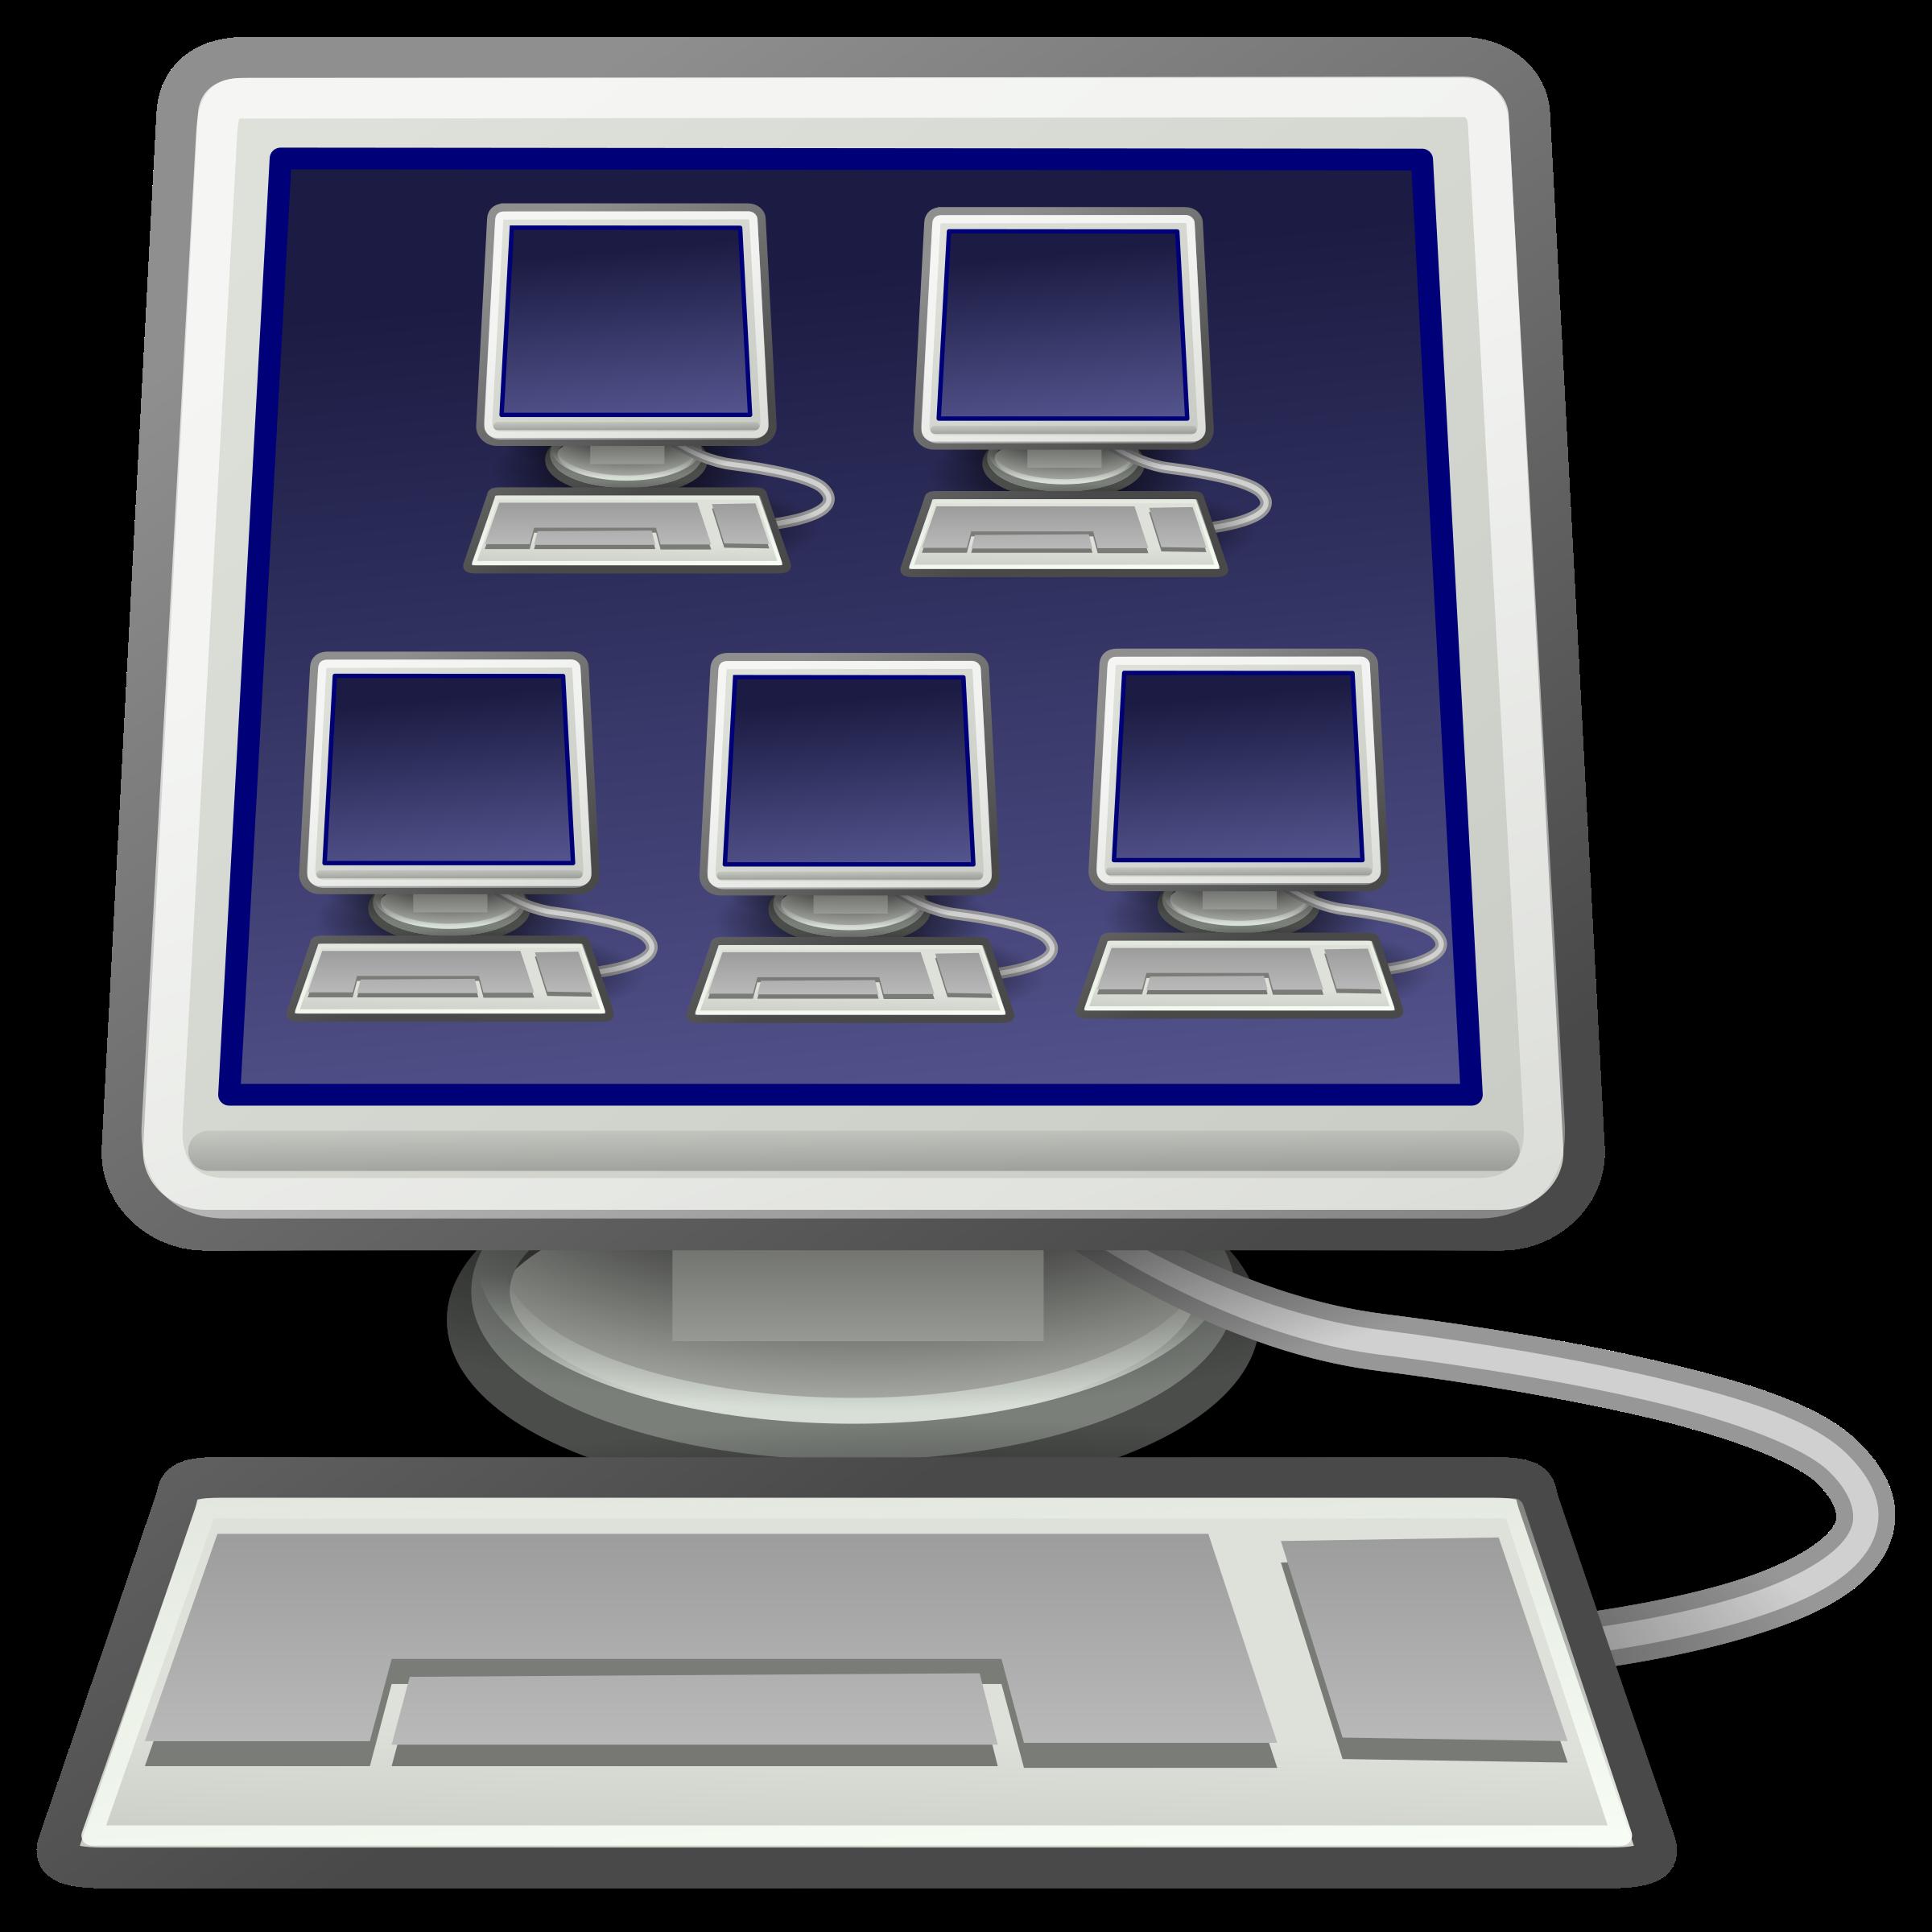 how to open mac resource monitor shortcut